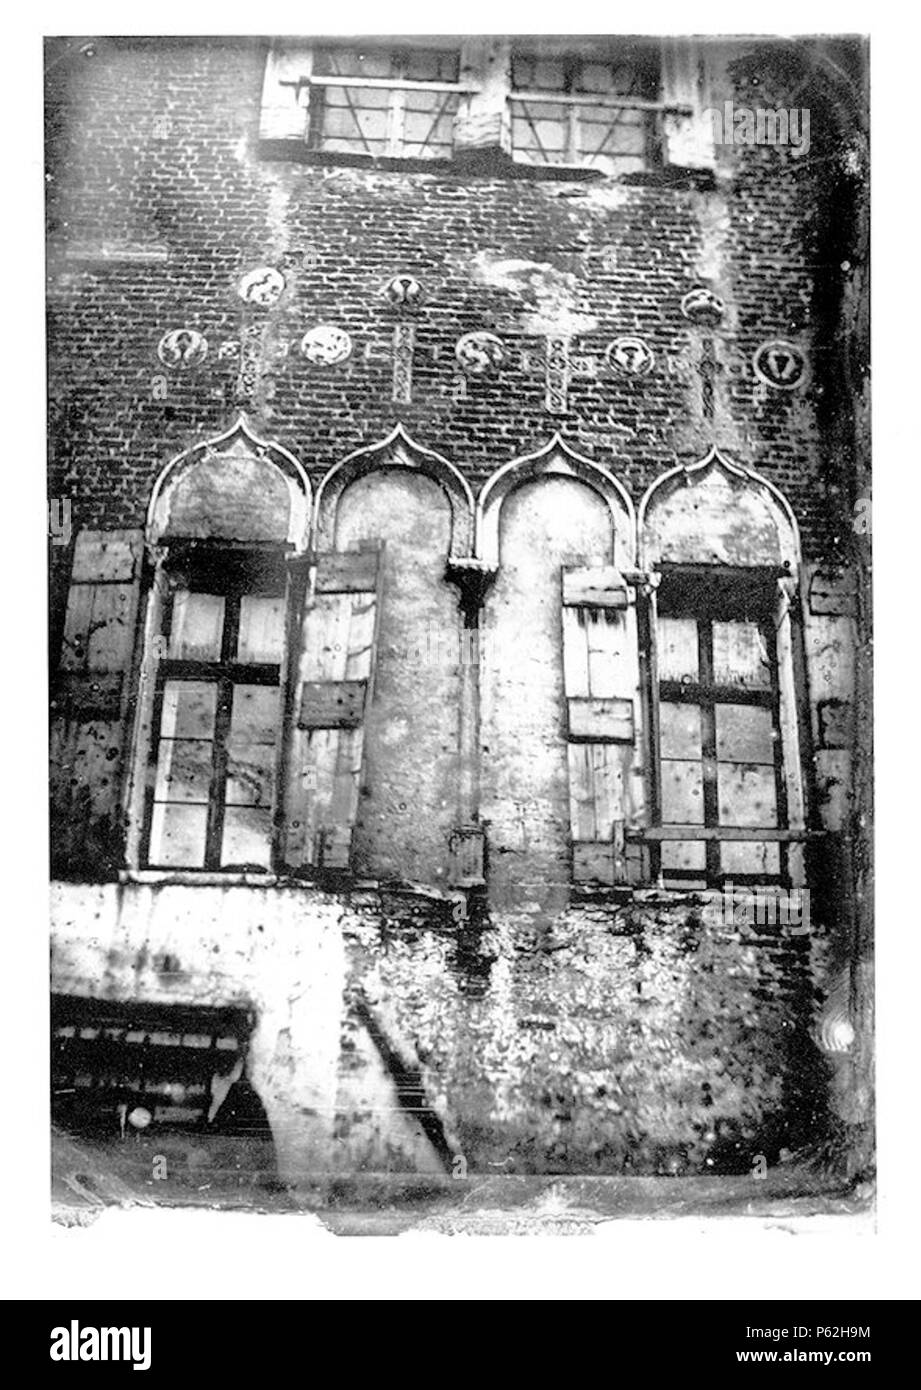 N A Inglese Daguerreotype Di Una Quadrifora Bizantina Nella